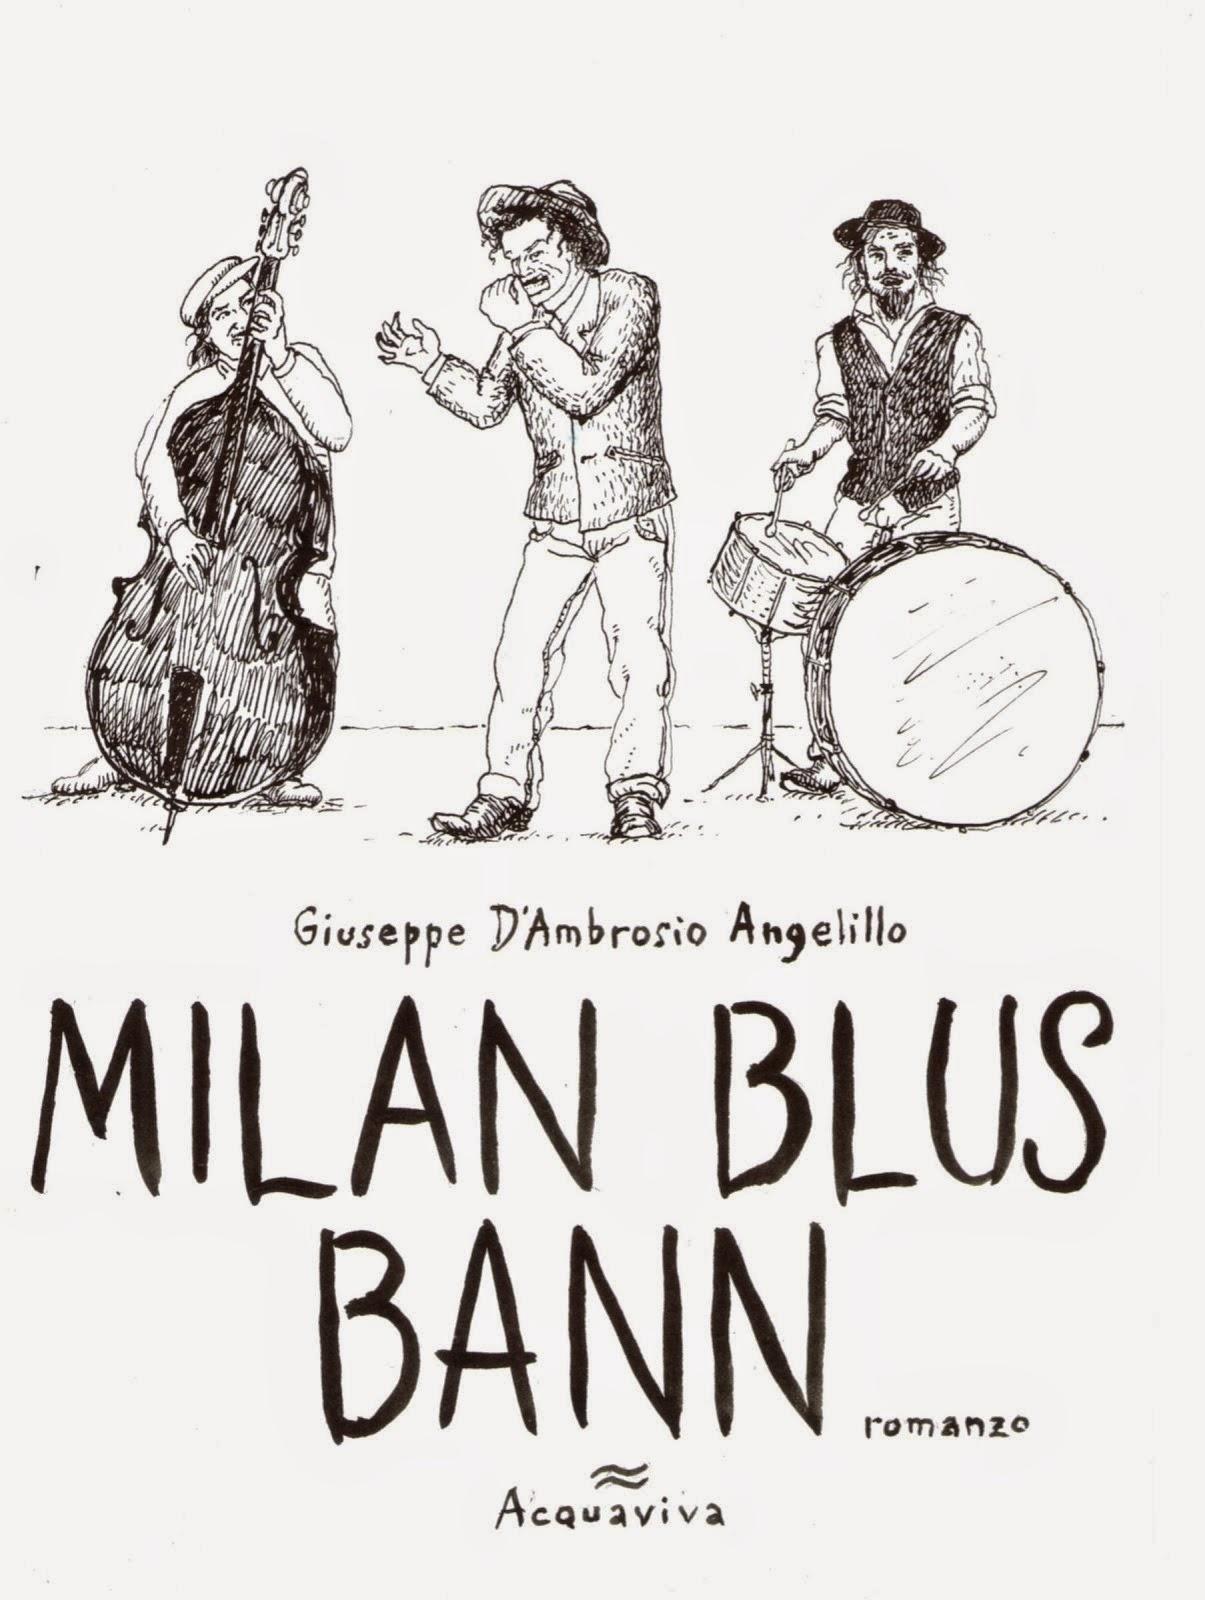 MILAN BLUS BANN romanzo di giuseppe d'ambrosio angelillo